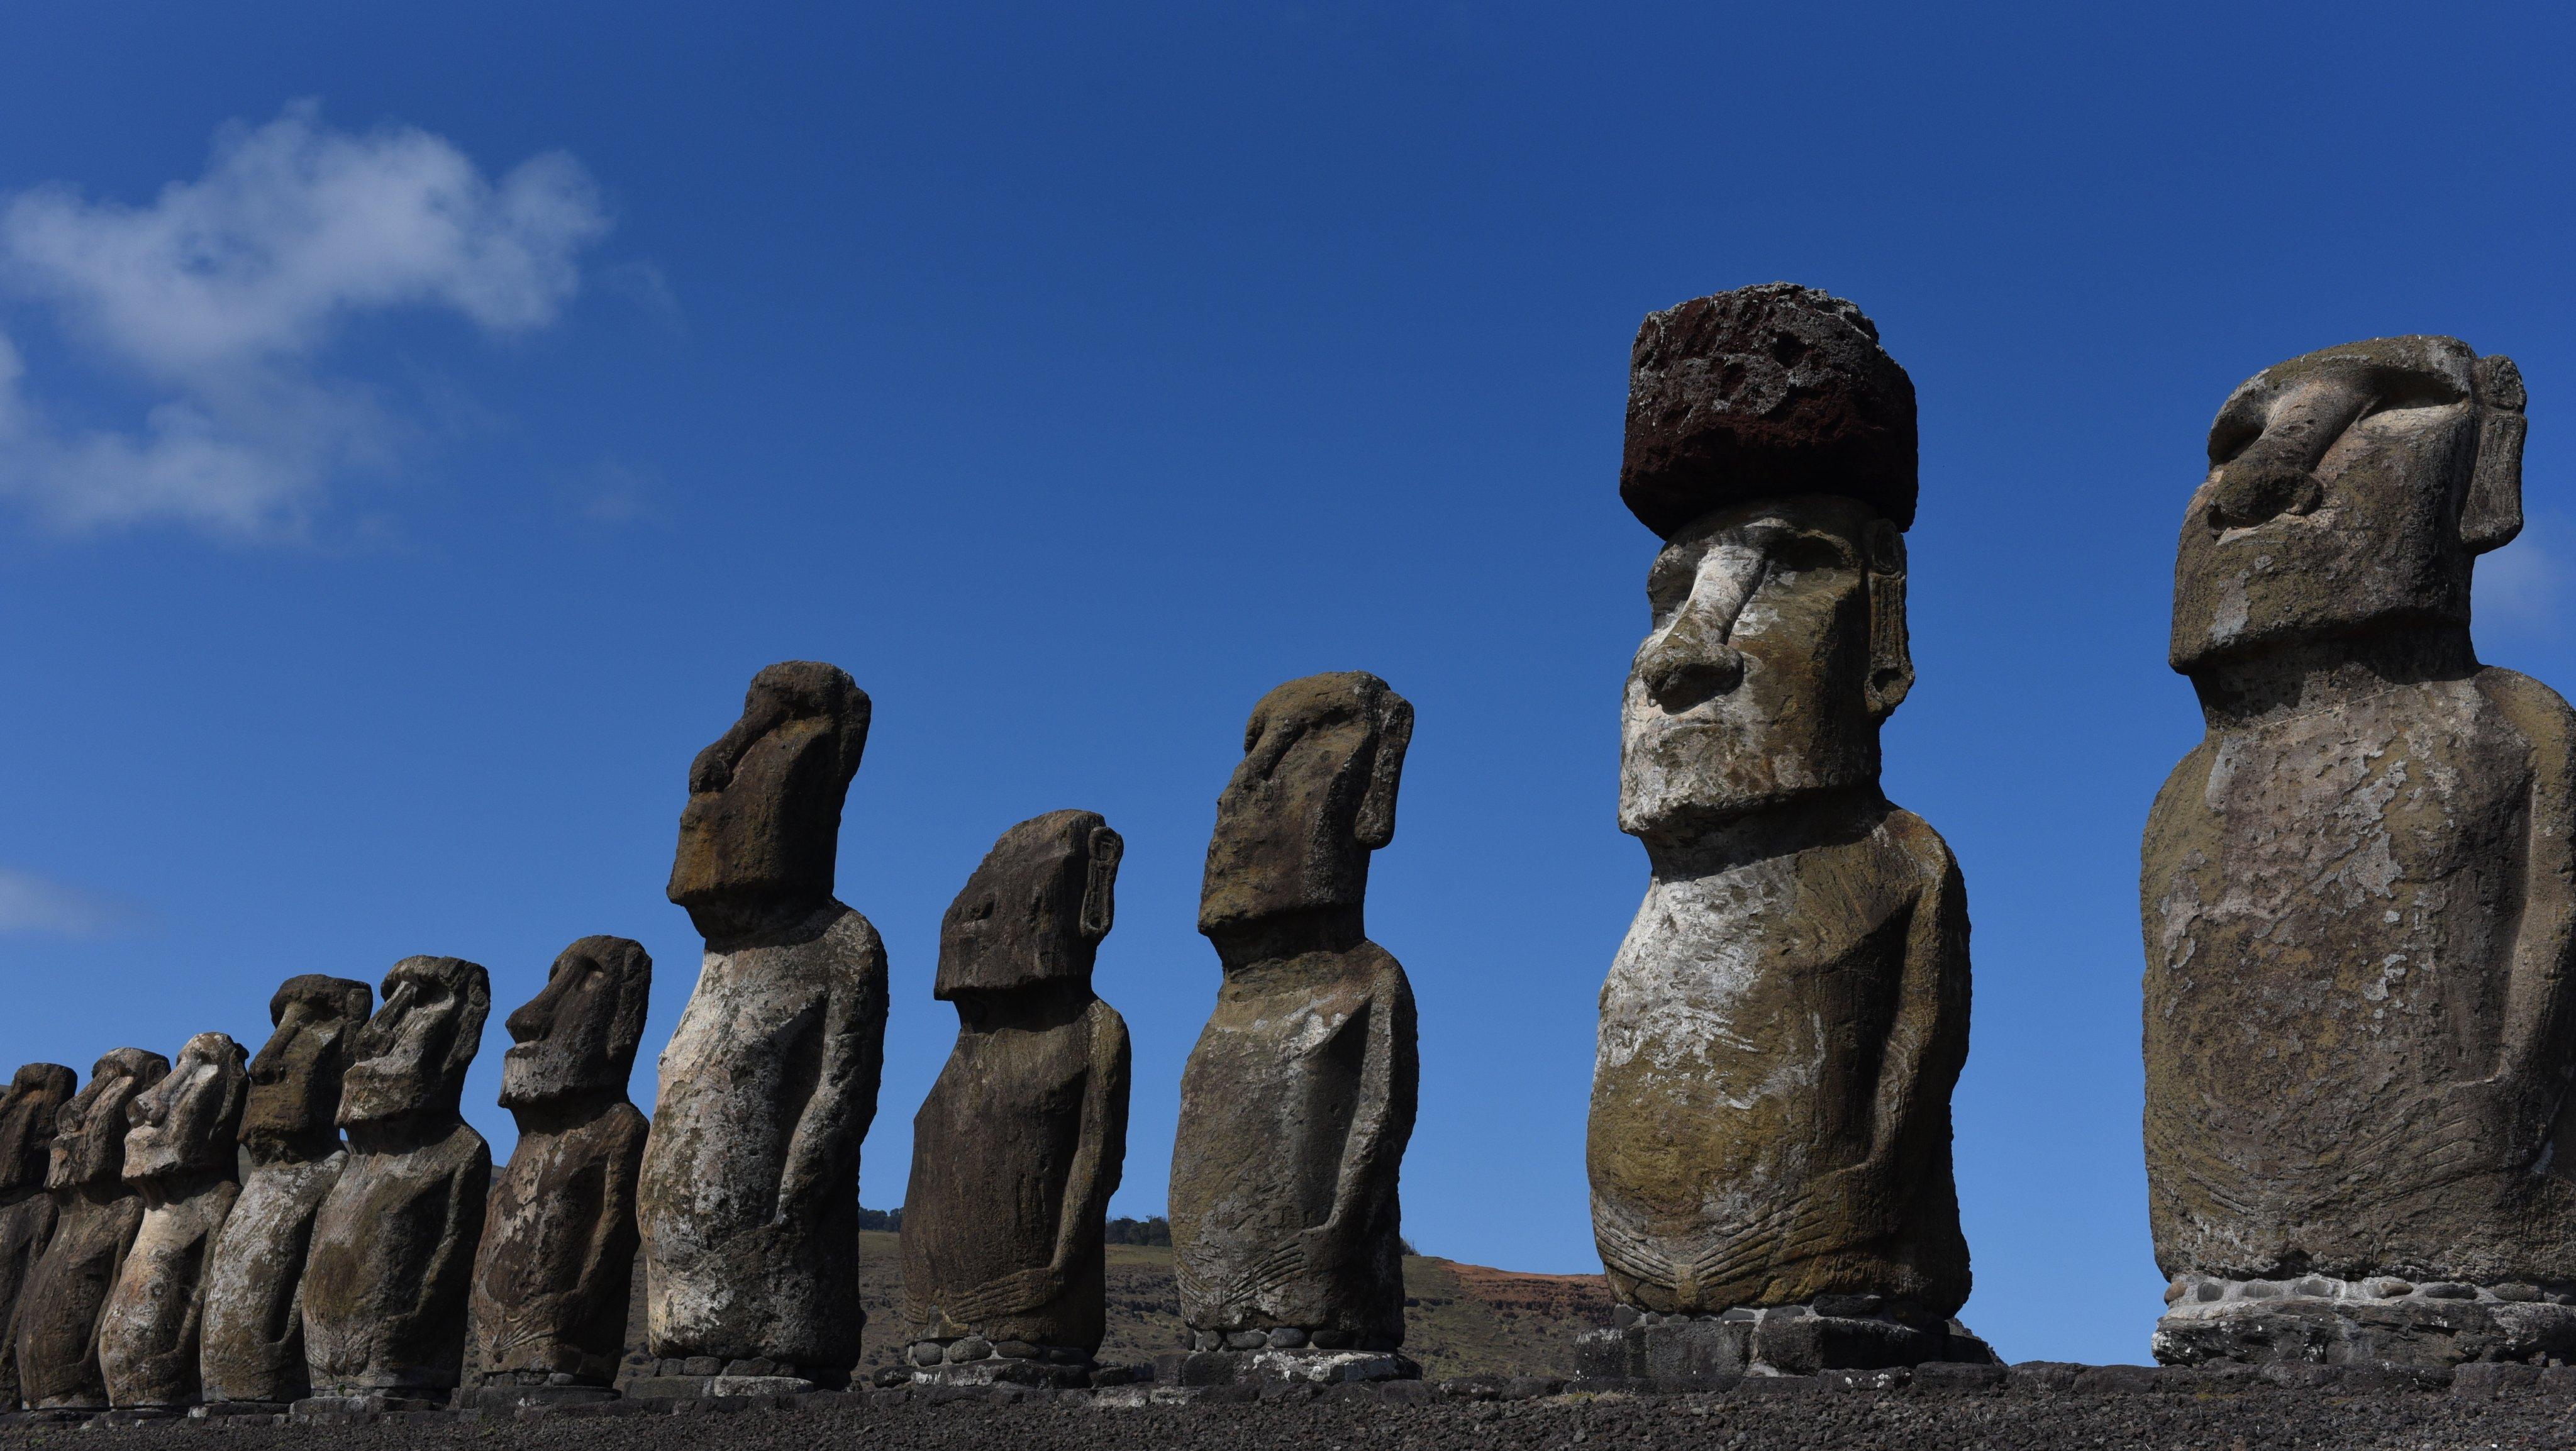 Moais seen at ceremonial platform Ahu Tongariki at Rapa Nui